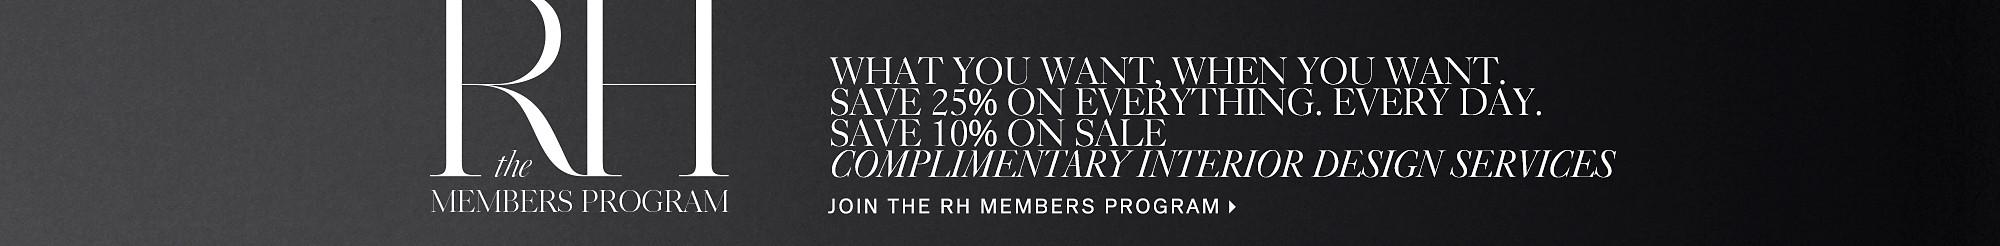 RH Members Program